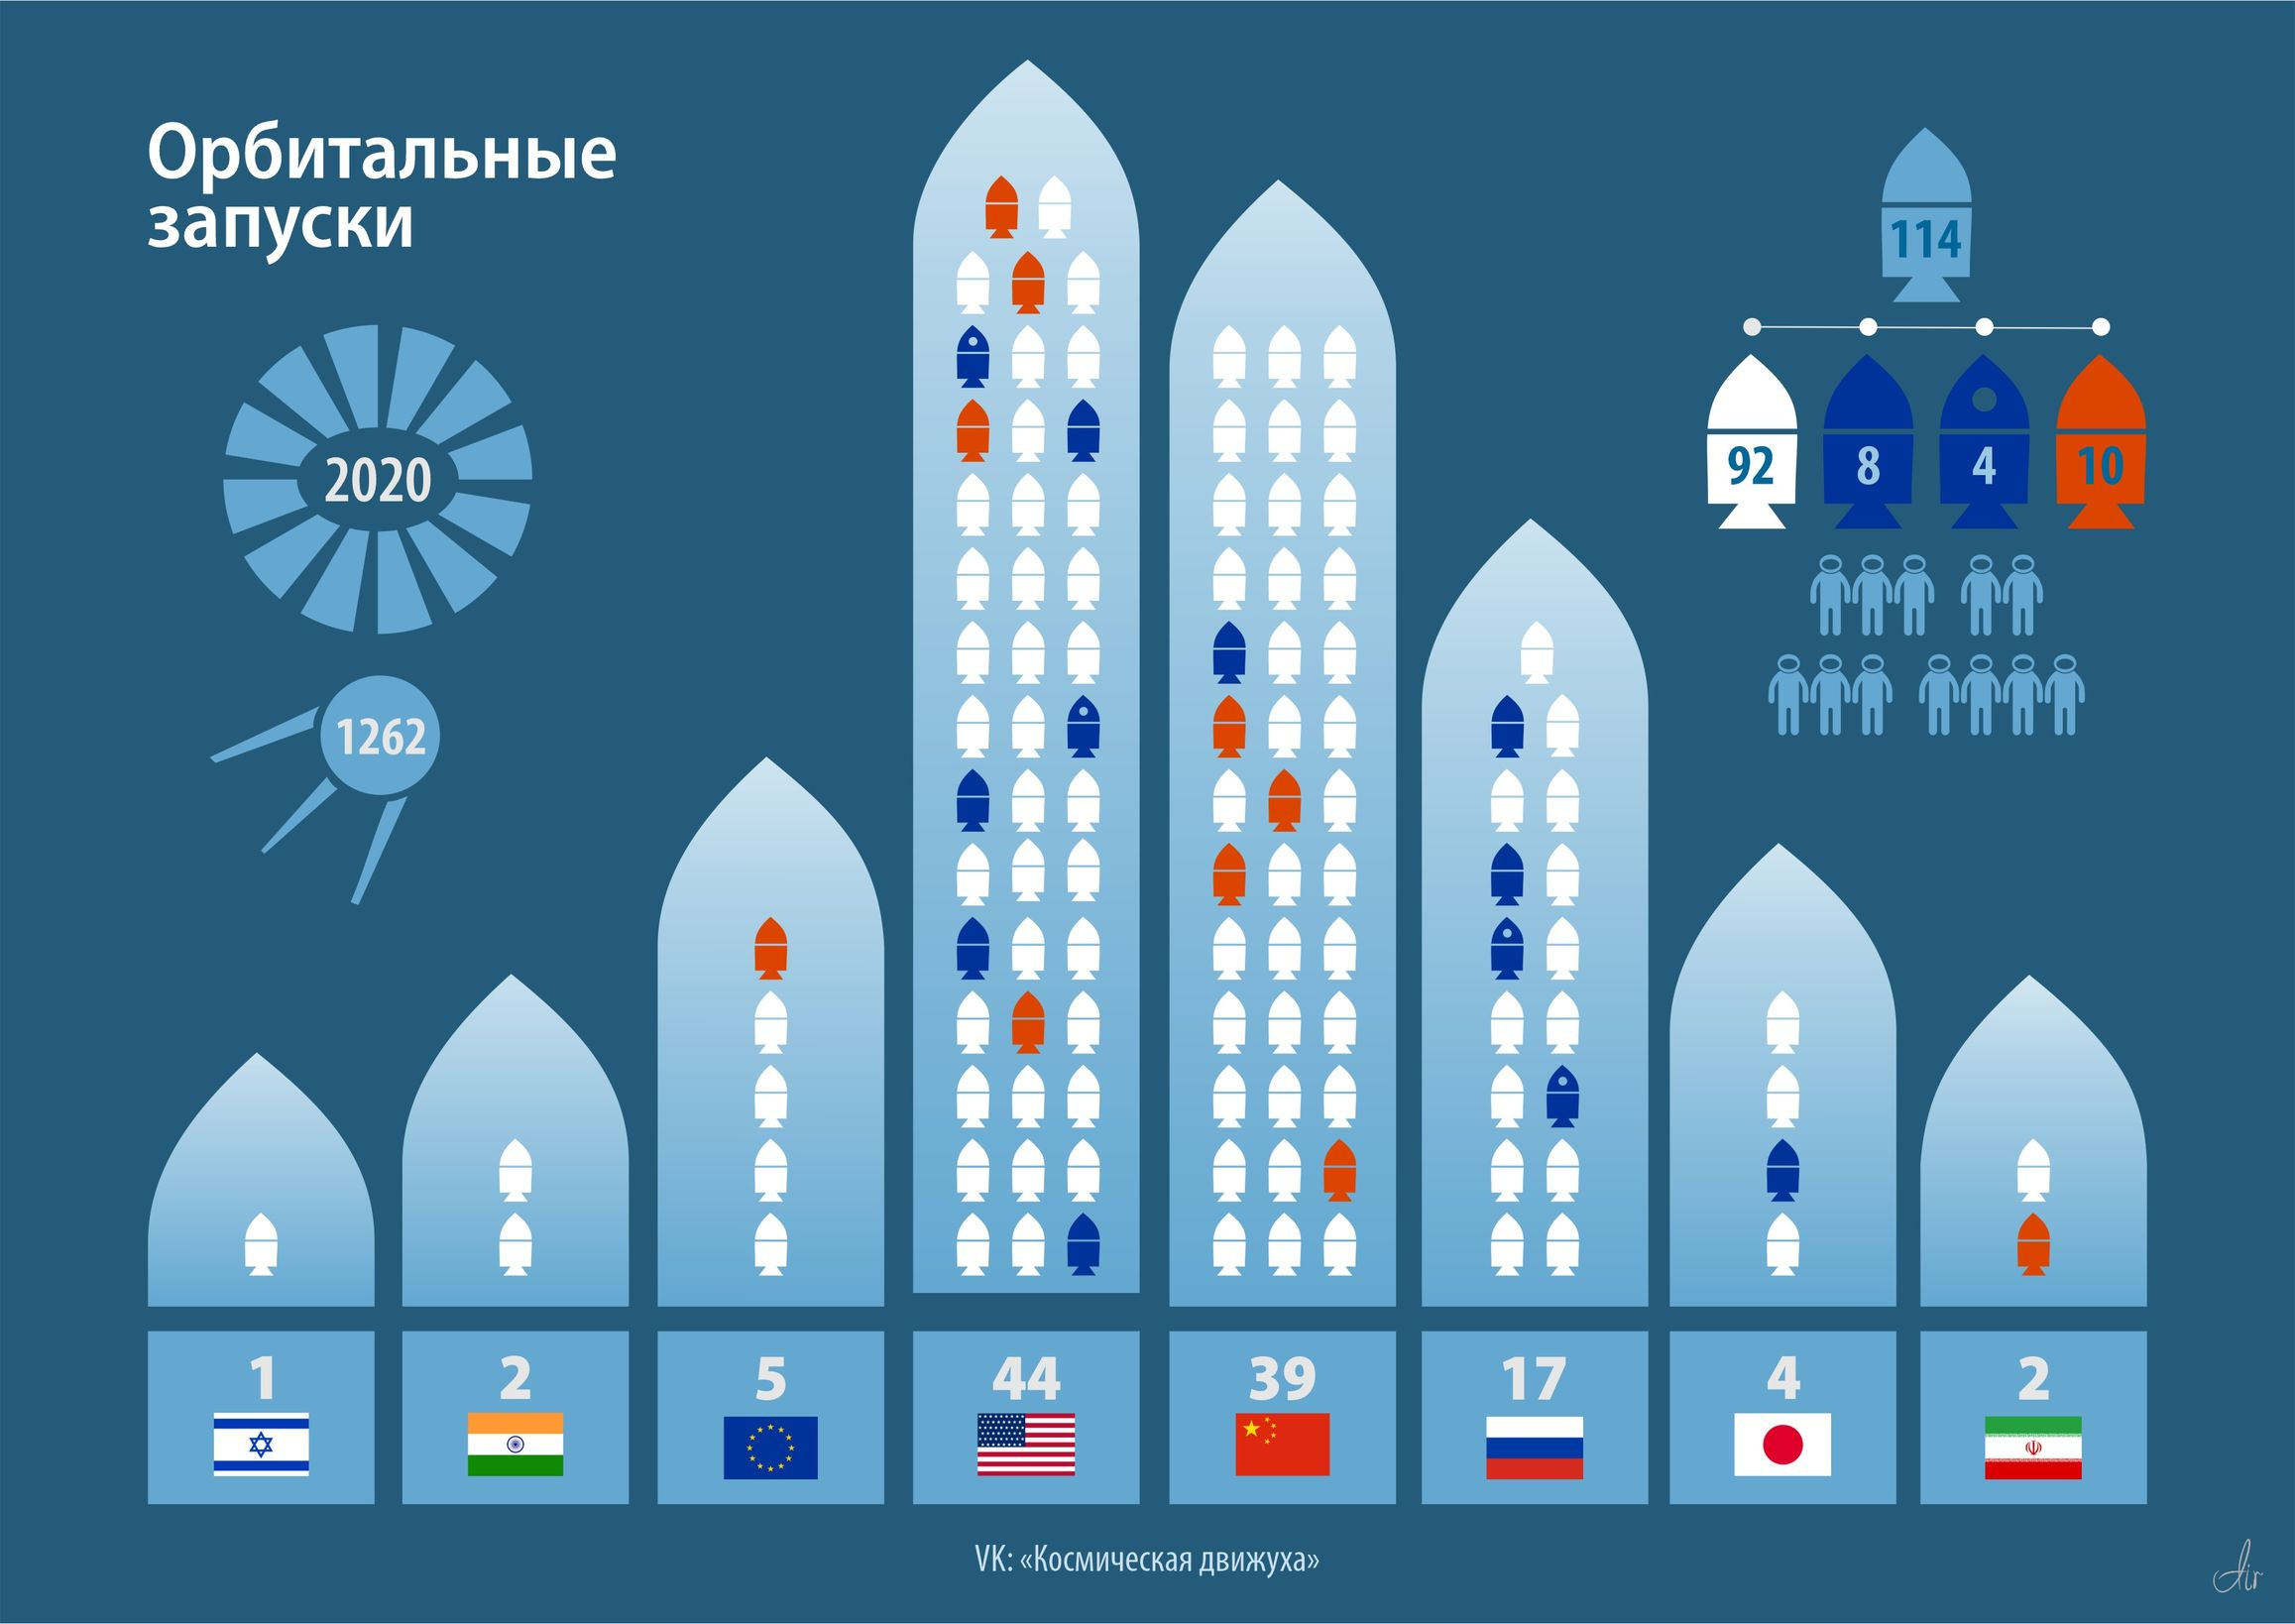 Статистика запусков за 2020 год по странам.